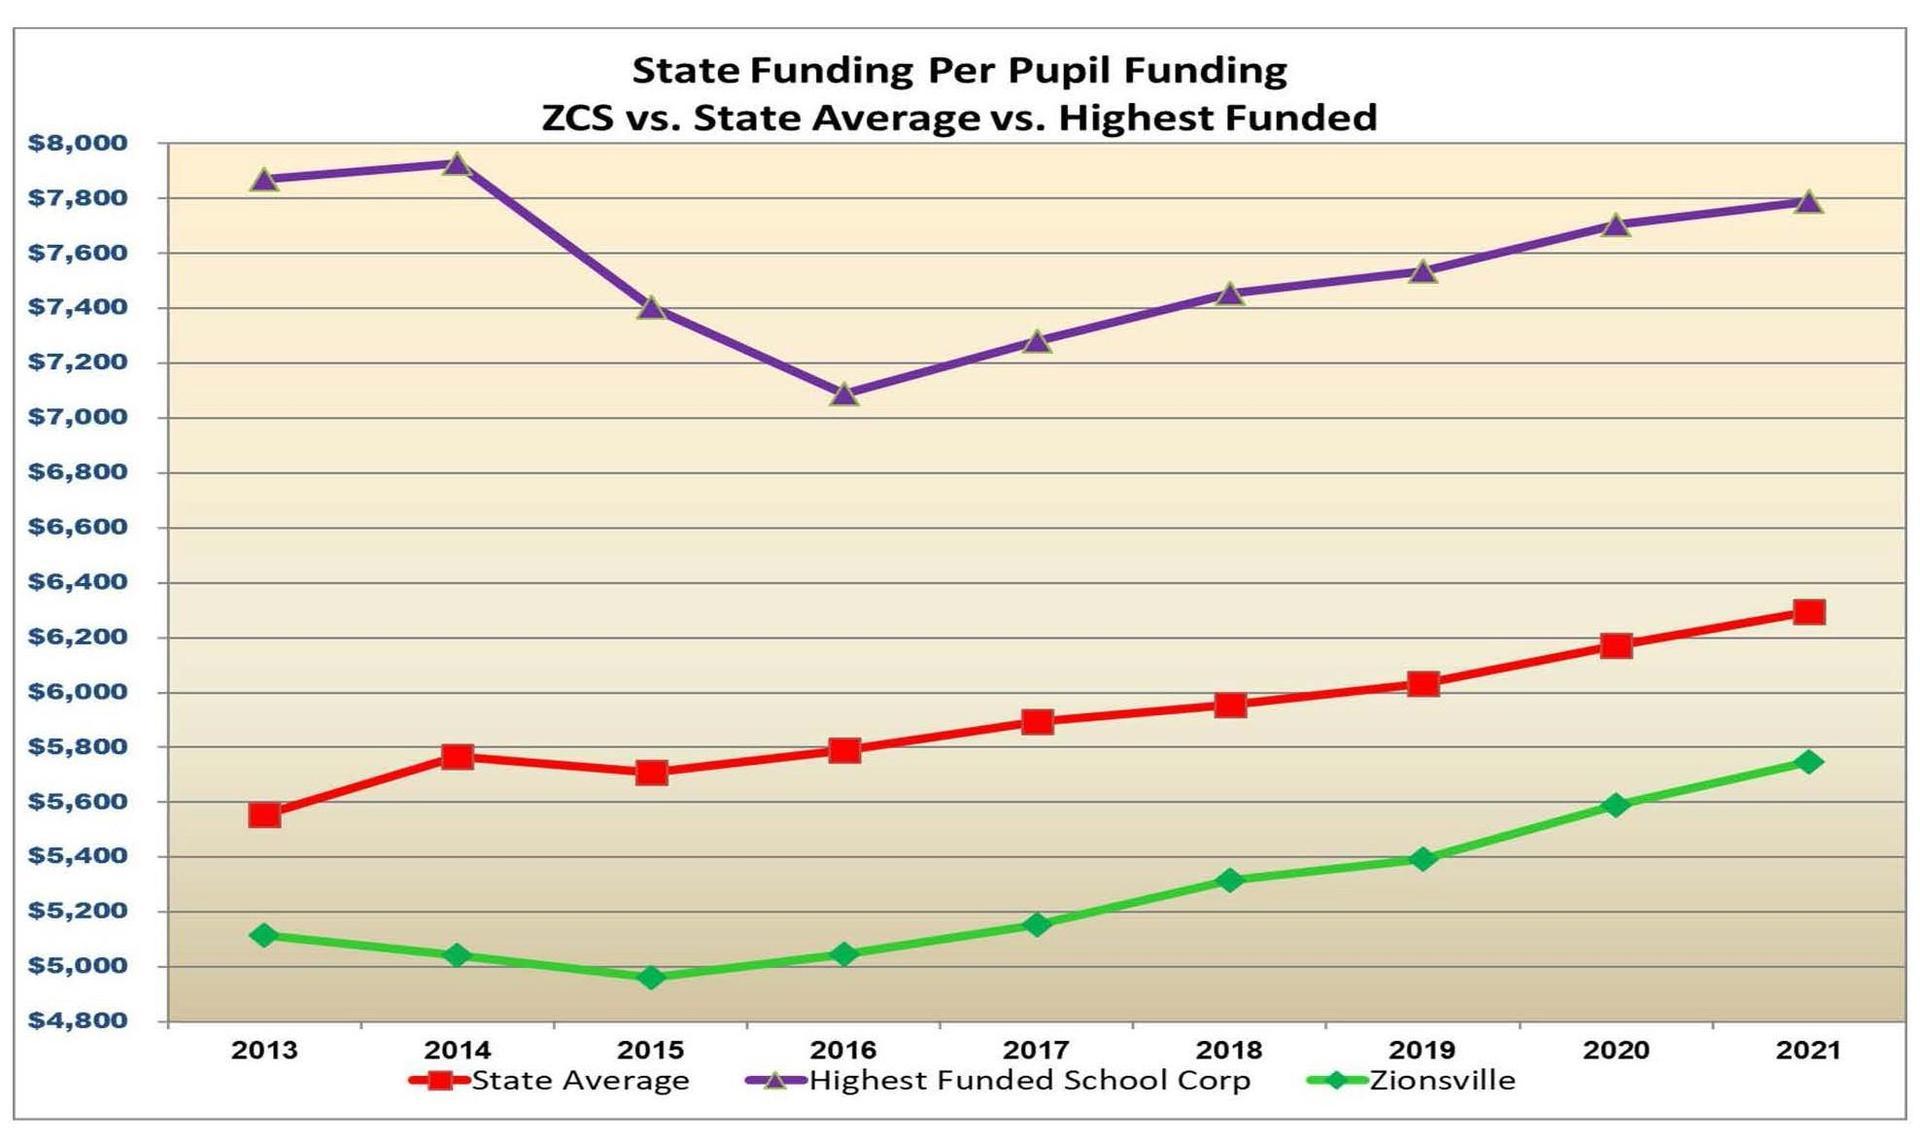 State Funding Per Pupil Funding